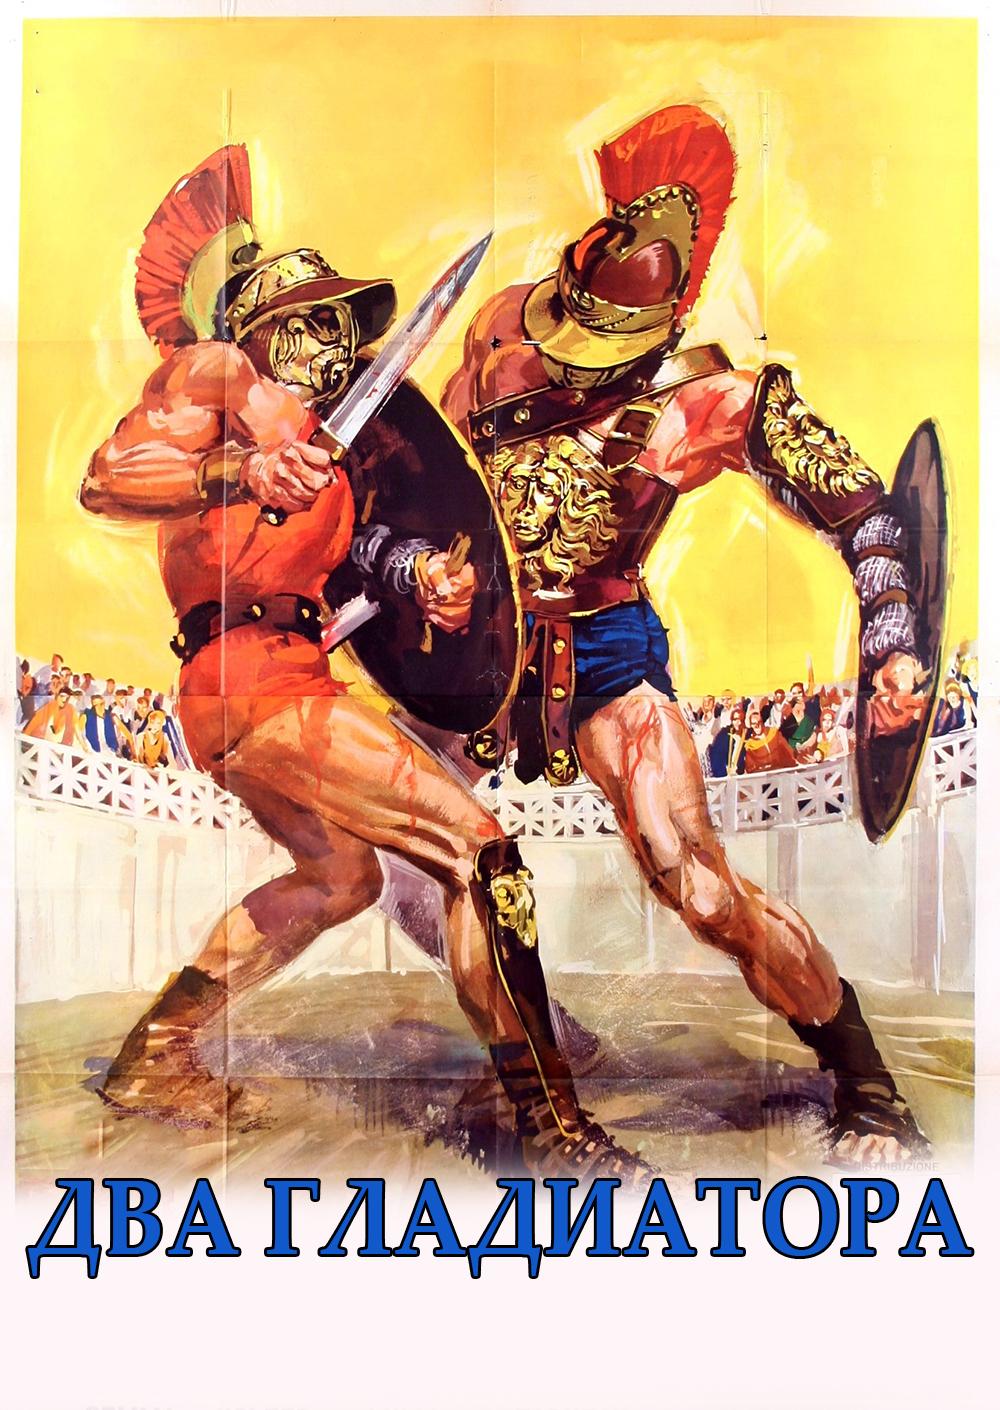 Два гладиатора